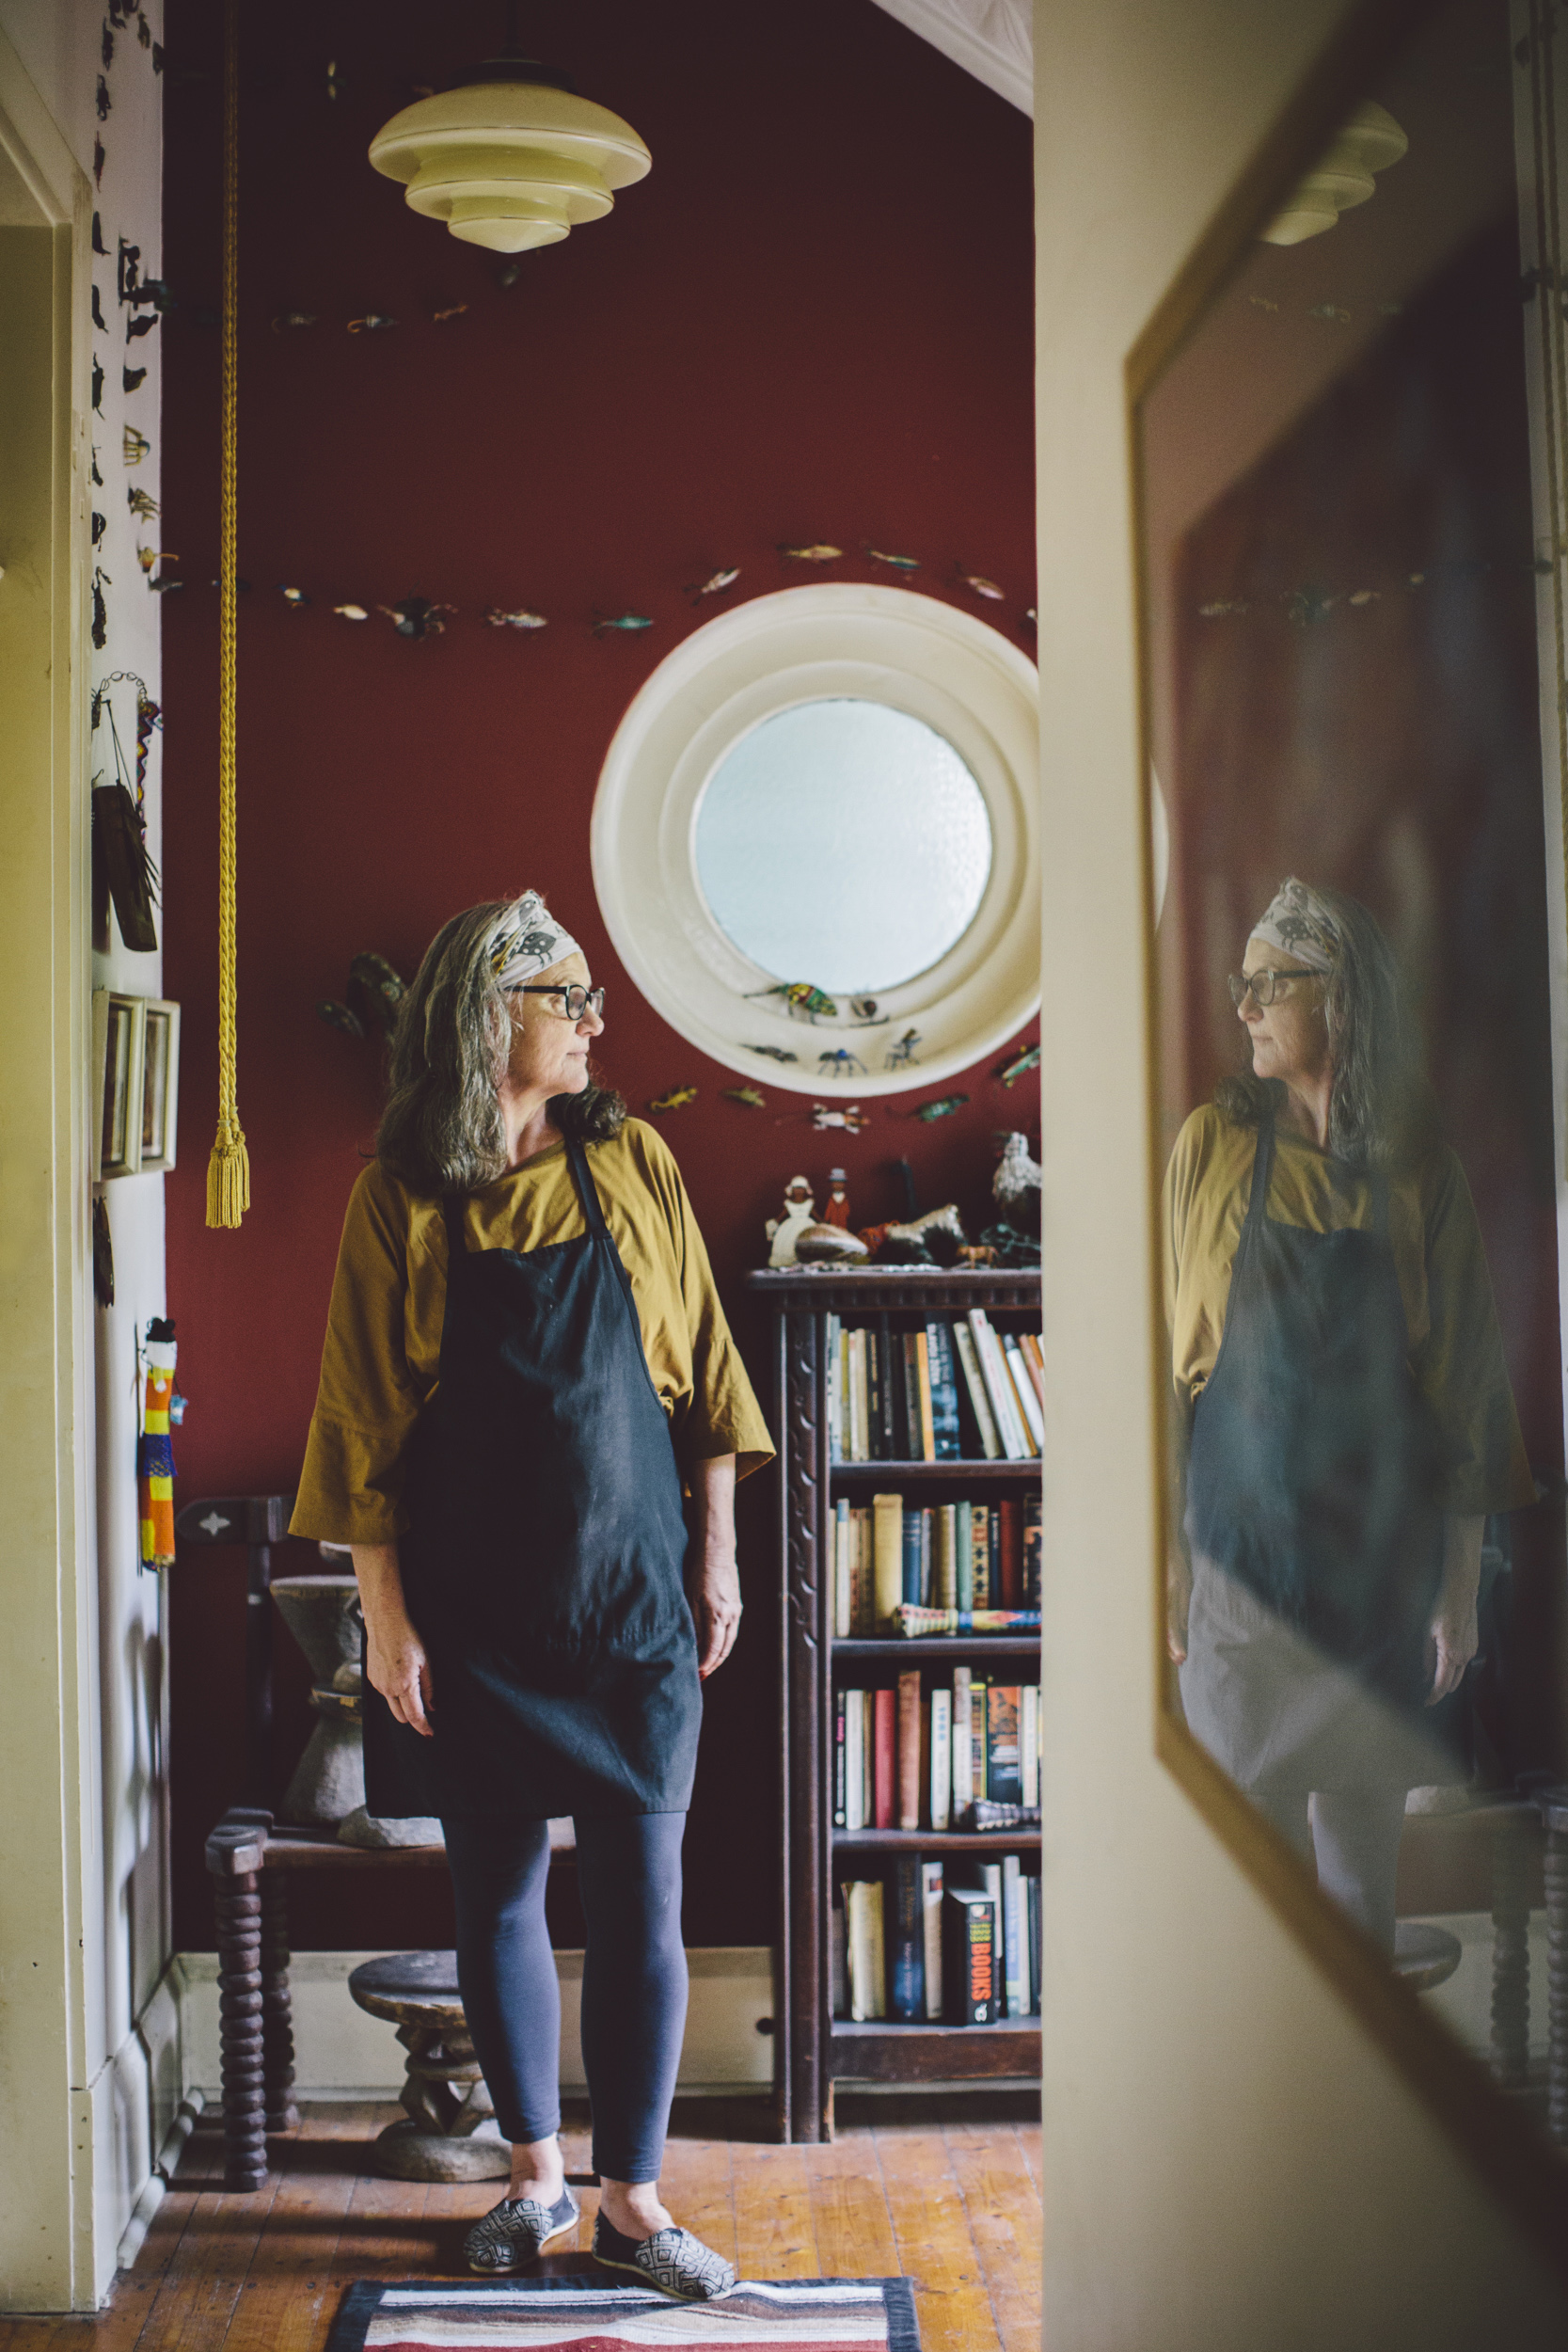 australian_textile_tracy_dunn_film_artist.142.jpg